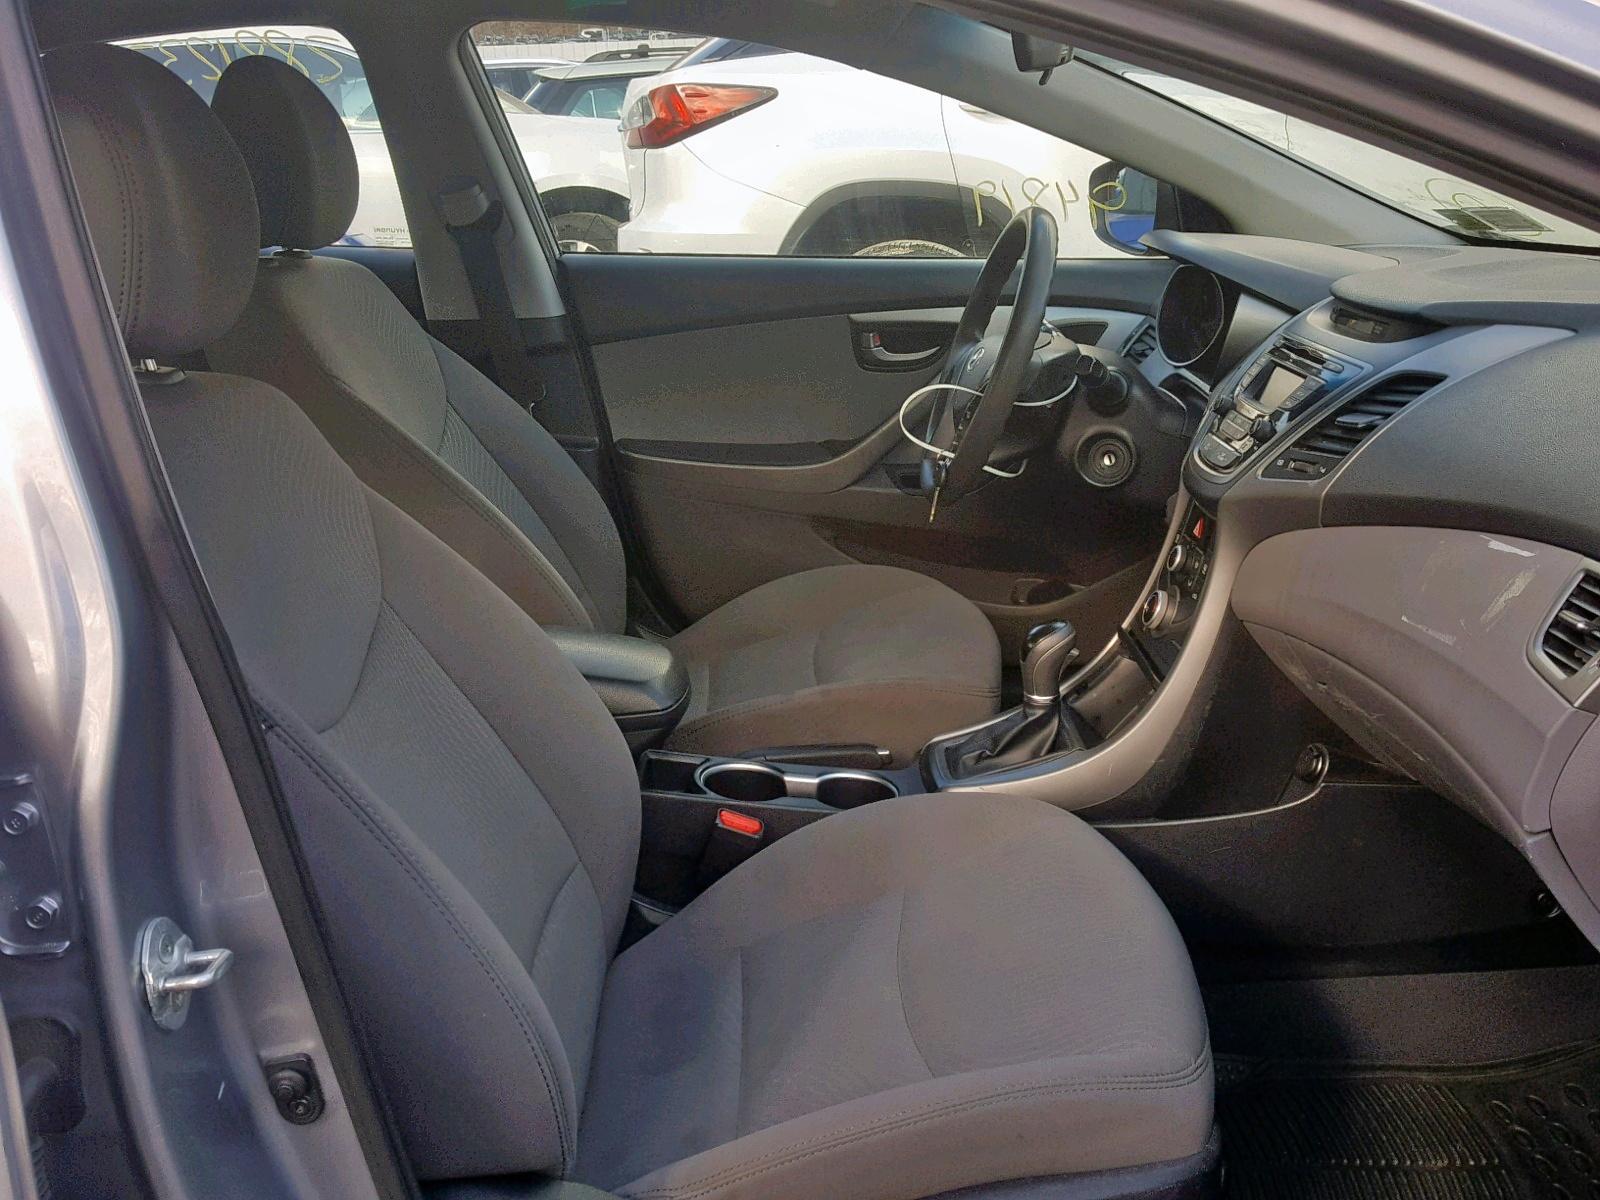 2015 Hyundai Elantra Se 1.8L close up View